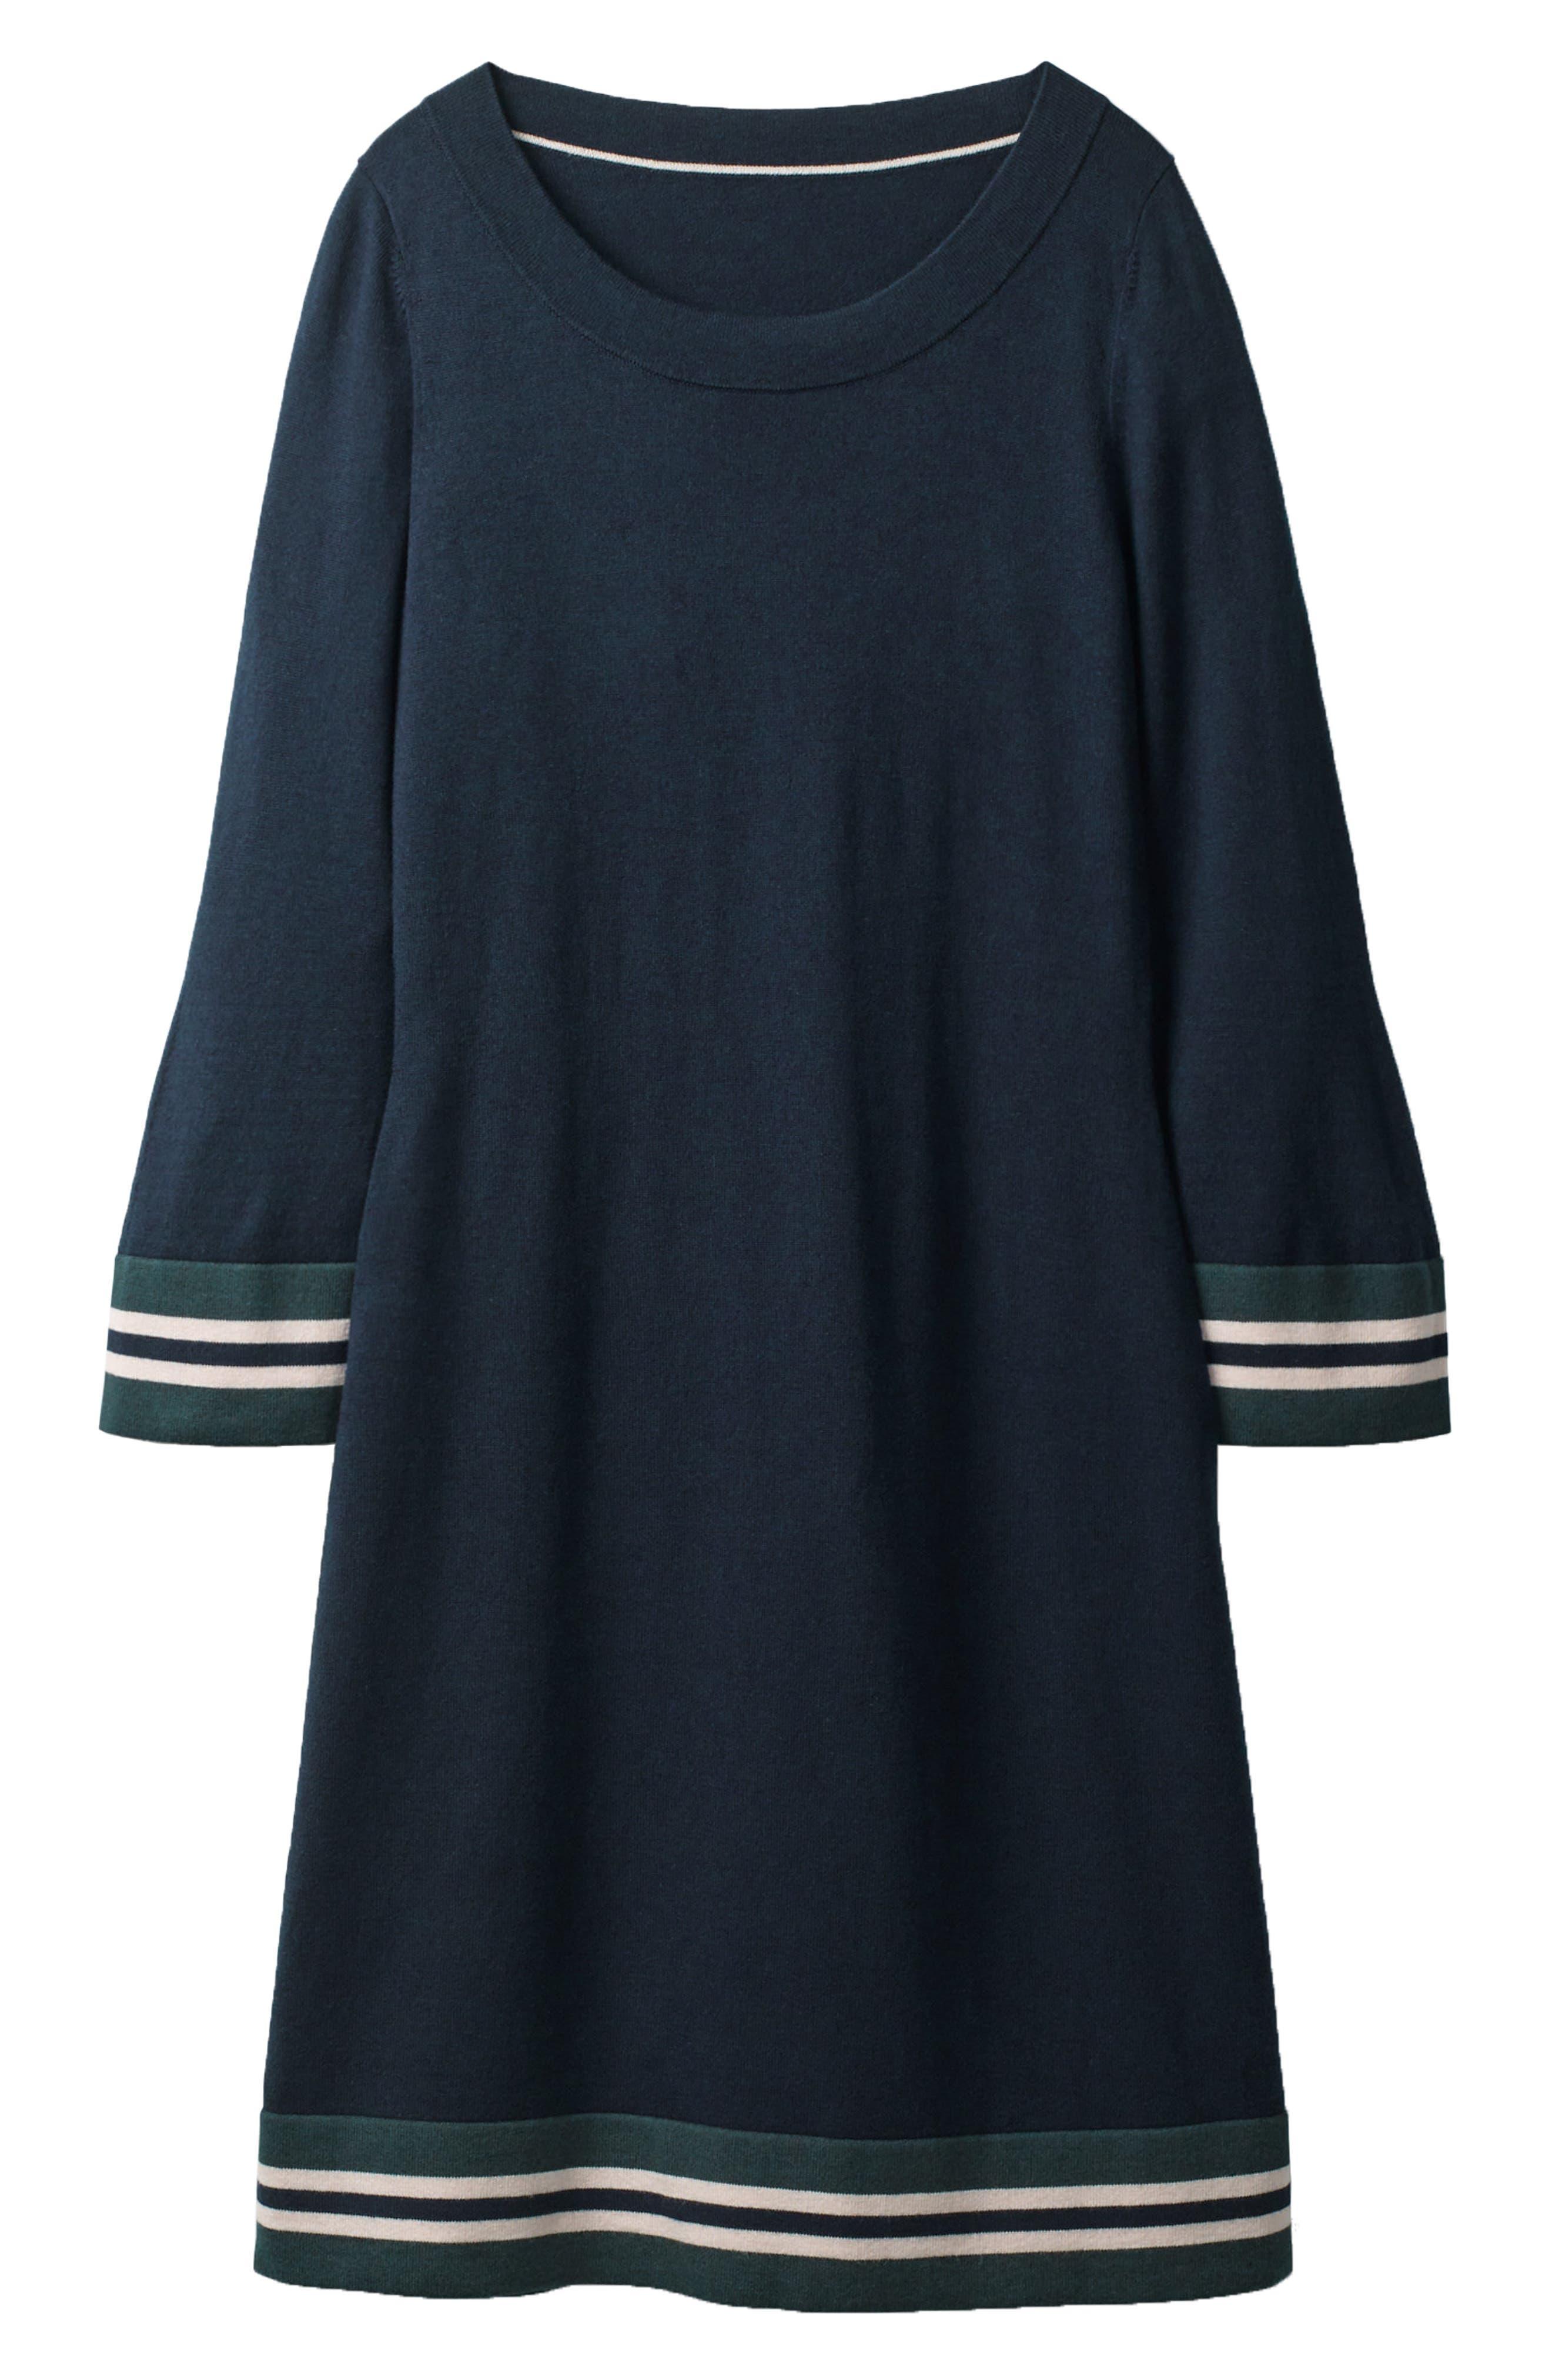 Border Stripe Shift Dress,                             Main thumbnail 1, color,                             Navy